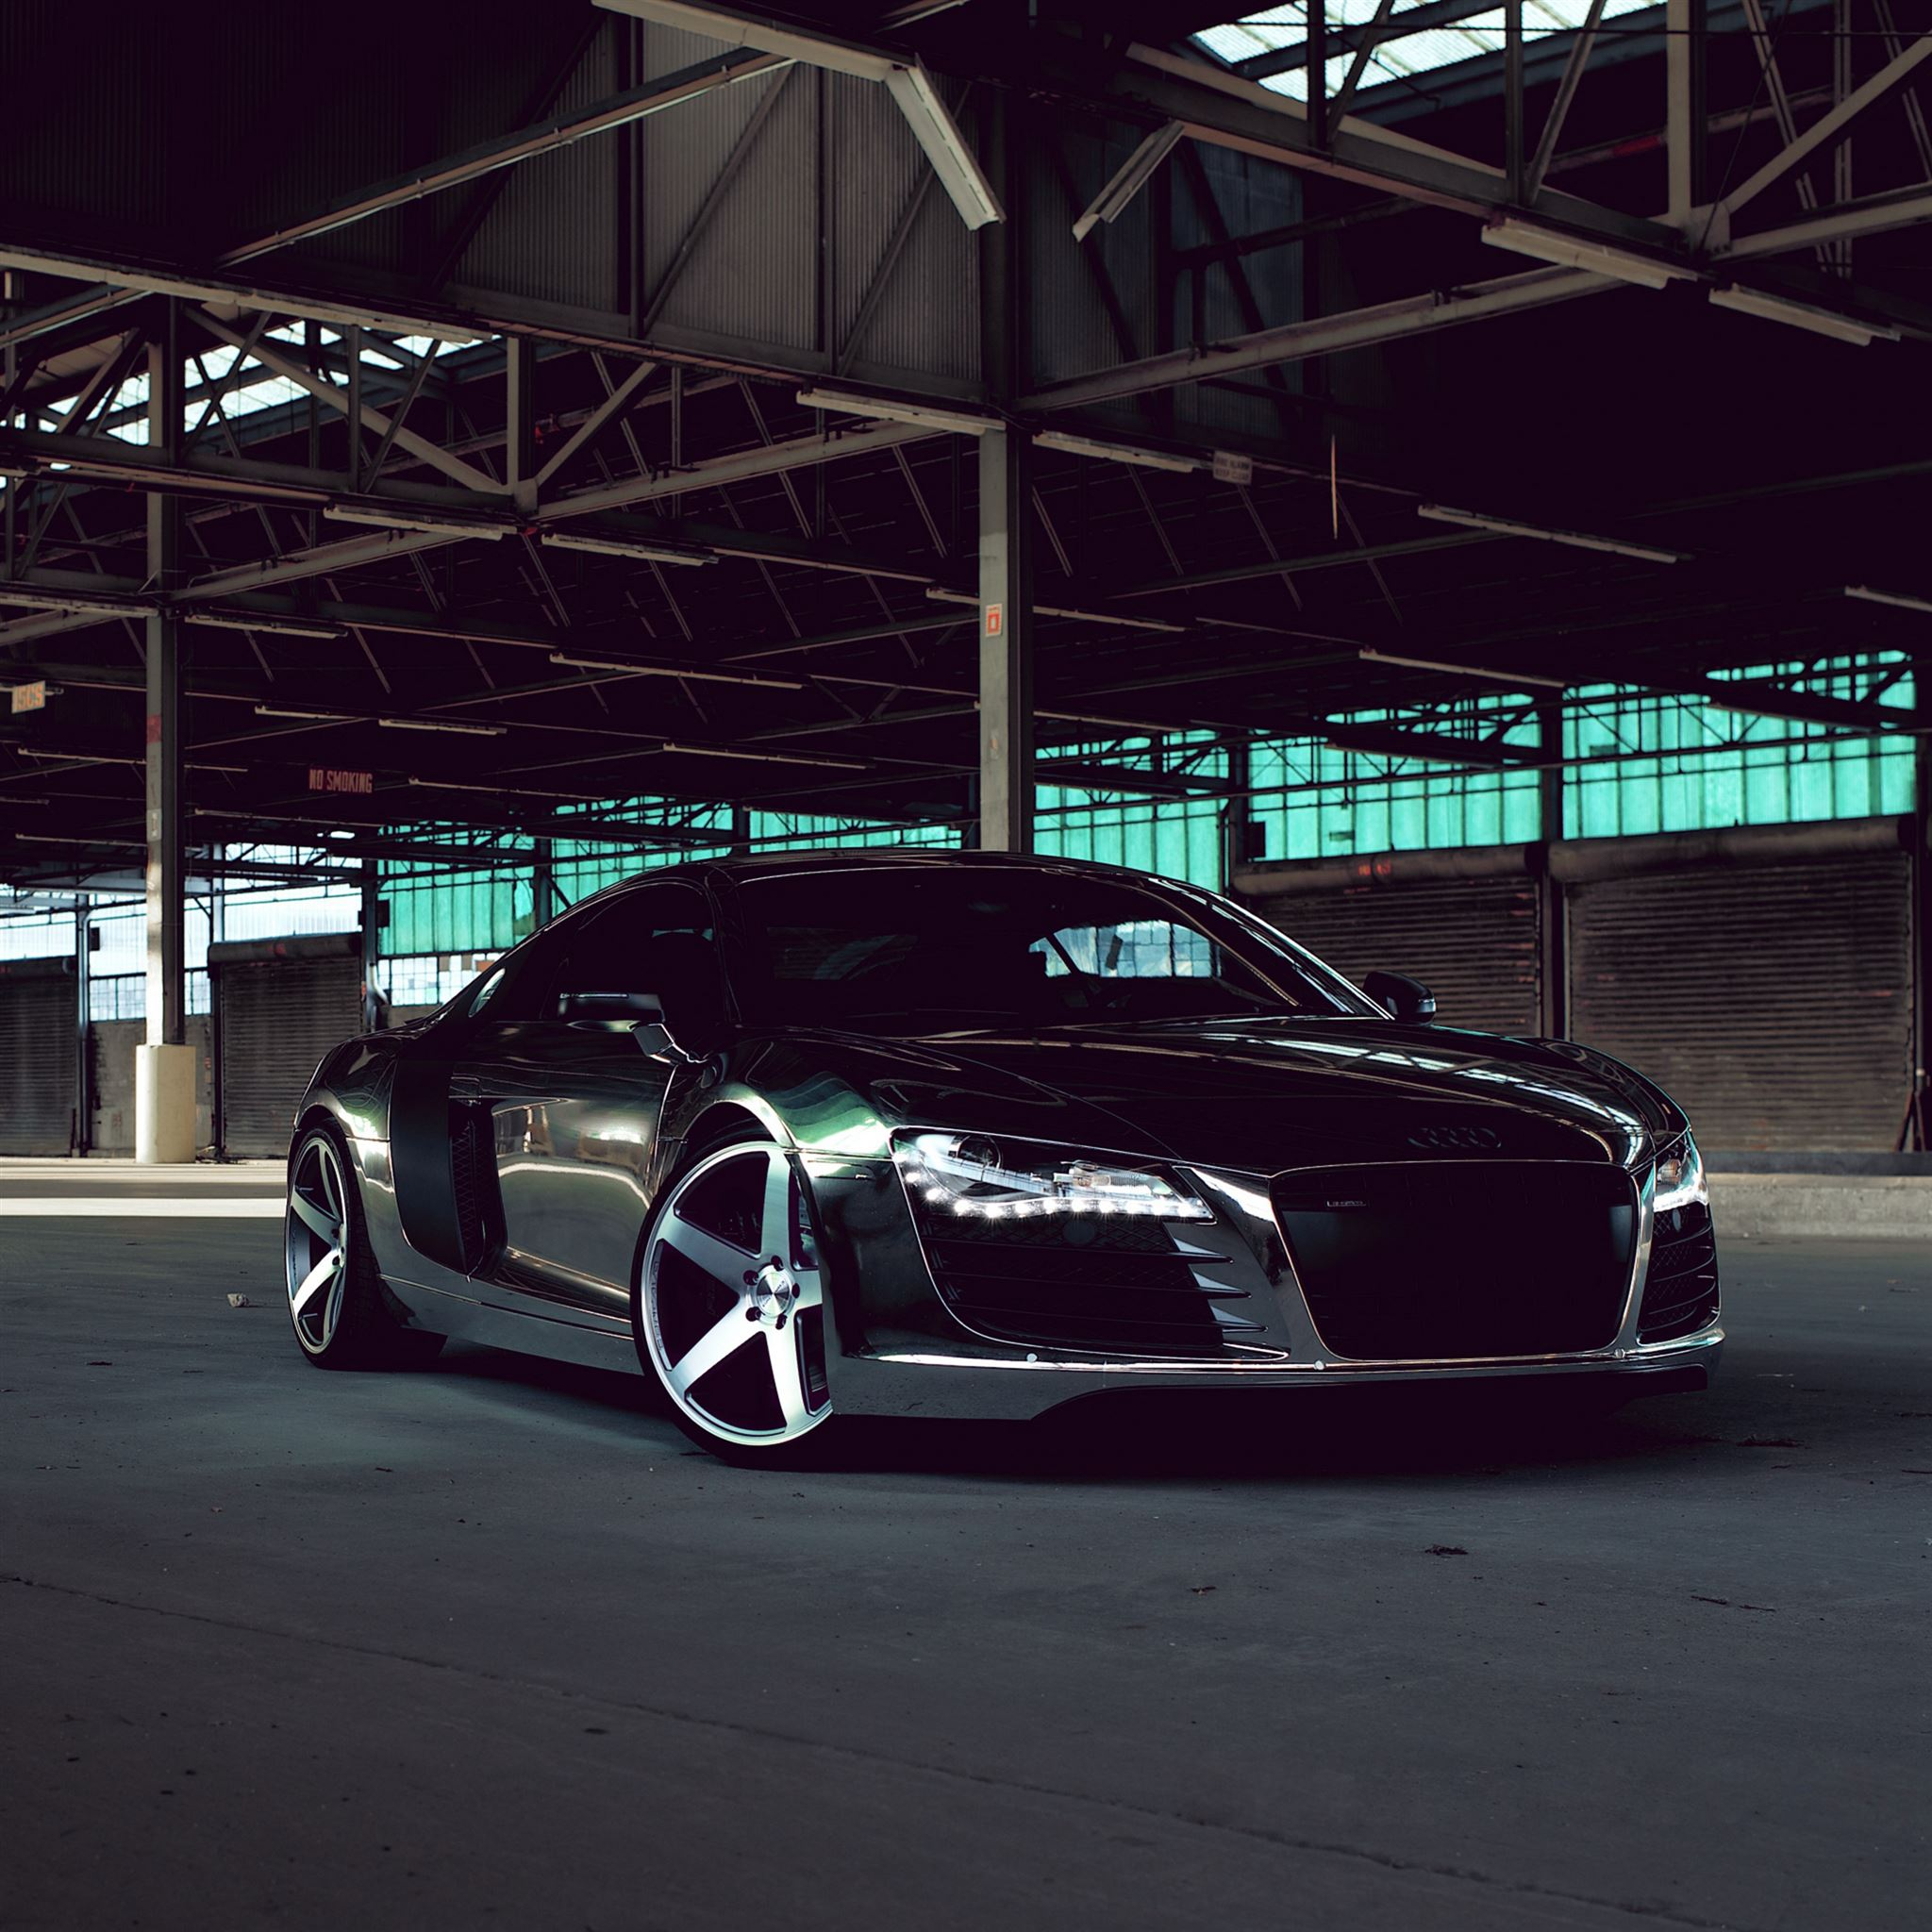 Audi R8 Chrome Cw 5 Matte Black Side View Ipad Pro Wallpapers Free Download